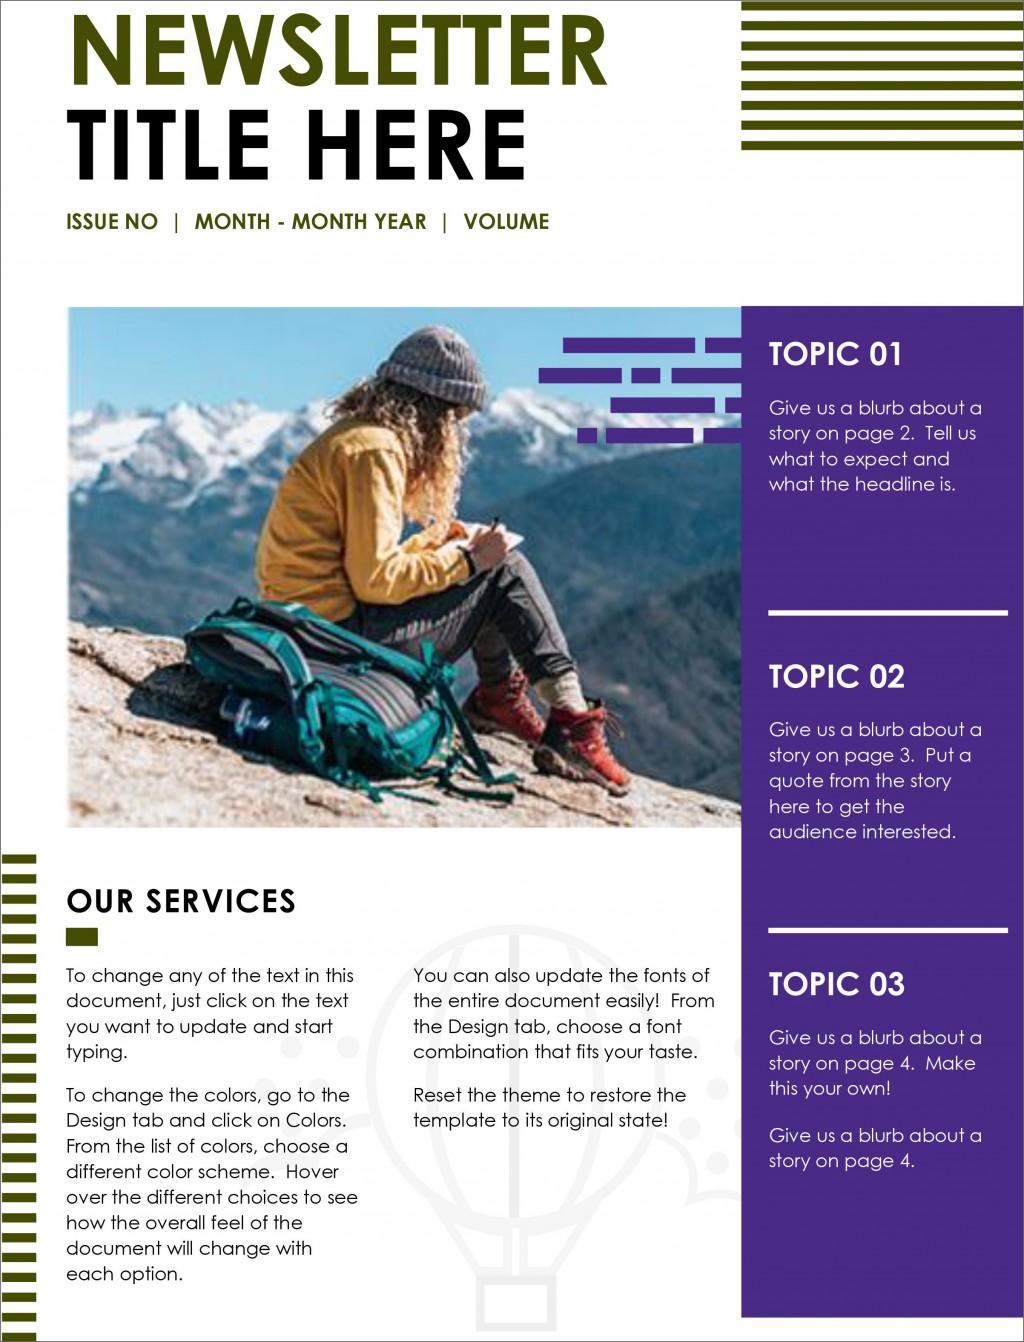 003 Impressive High School Newsletter Template Free Download Inspiration Large